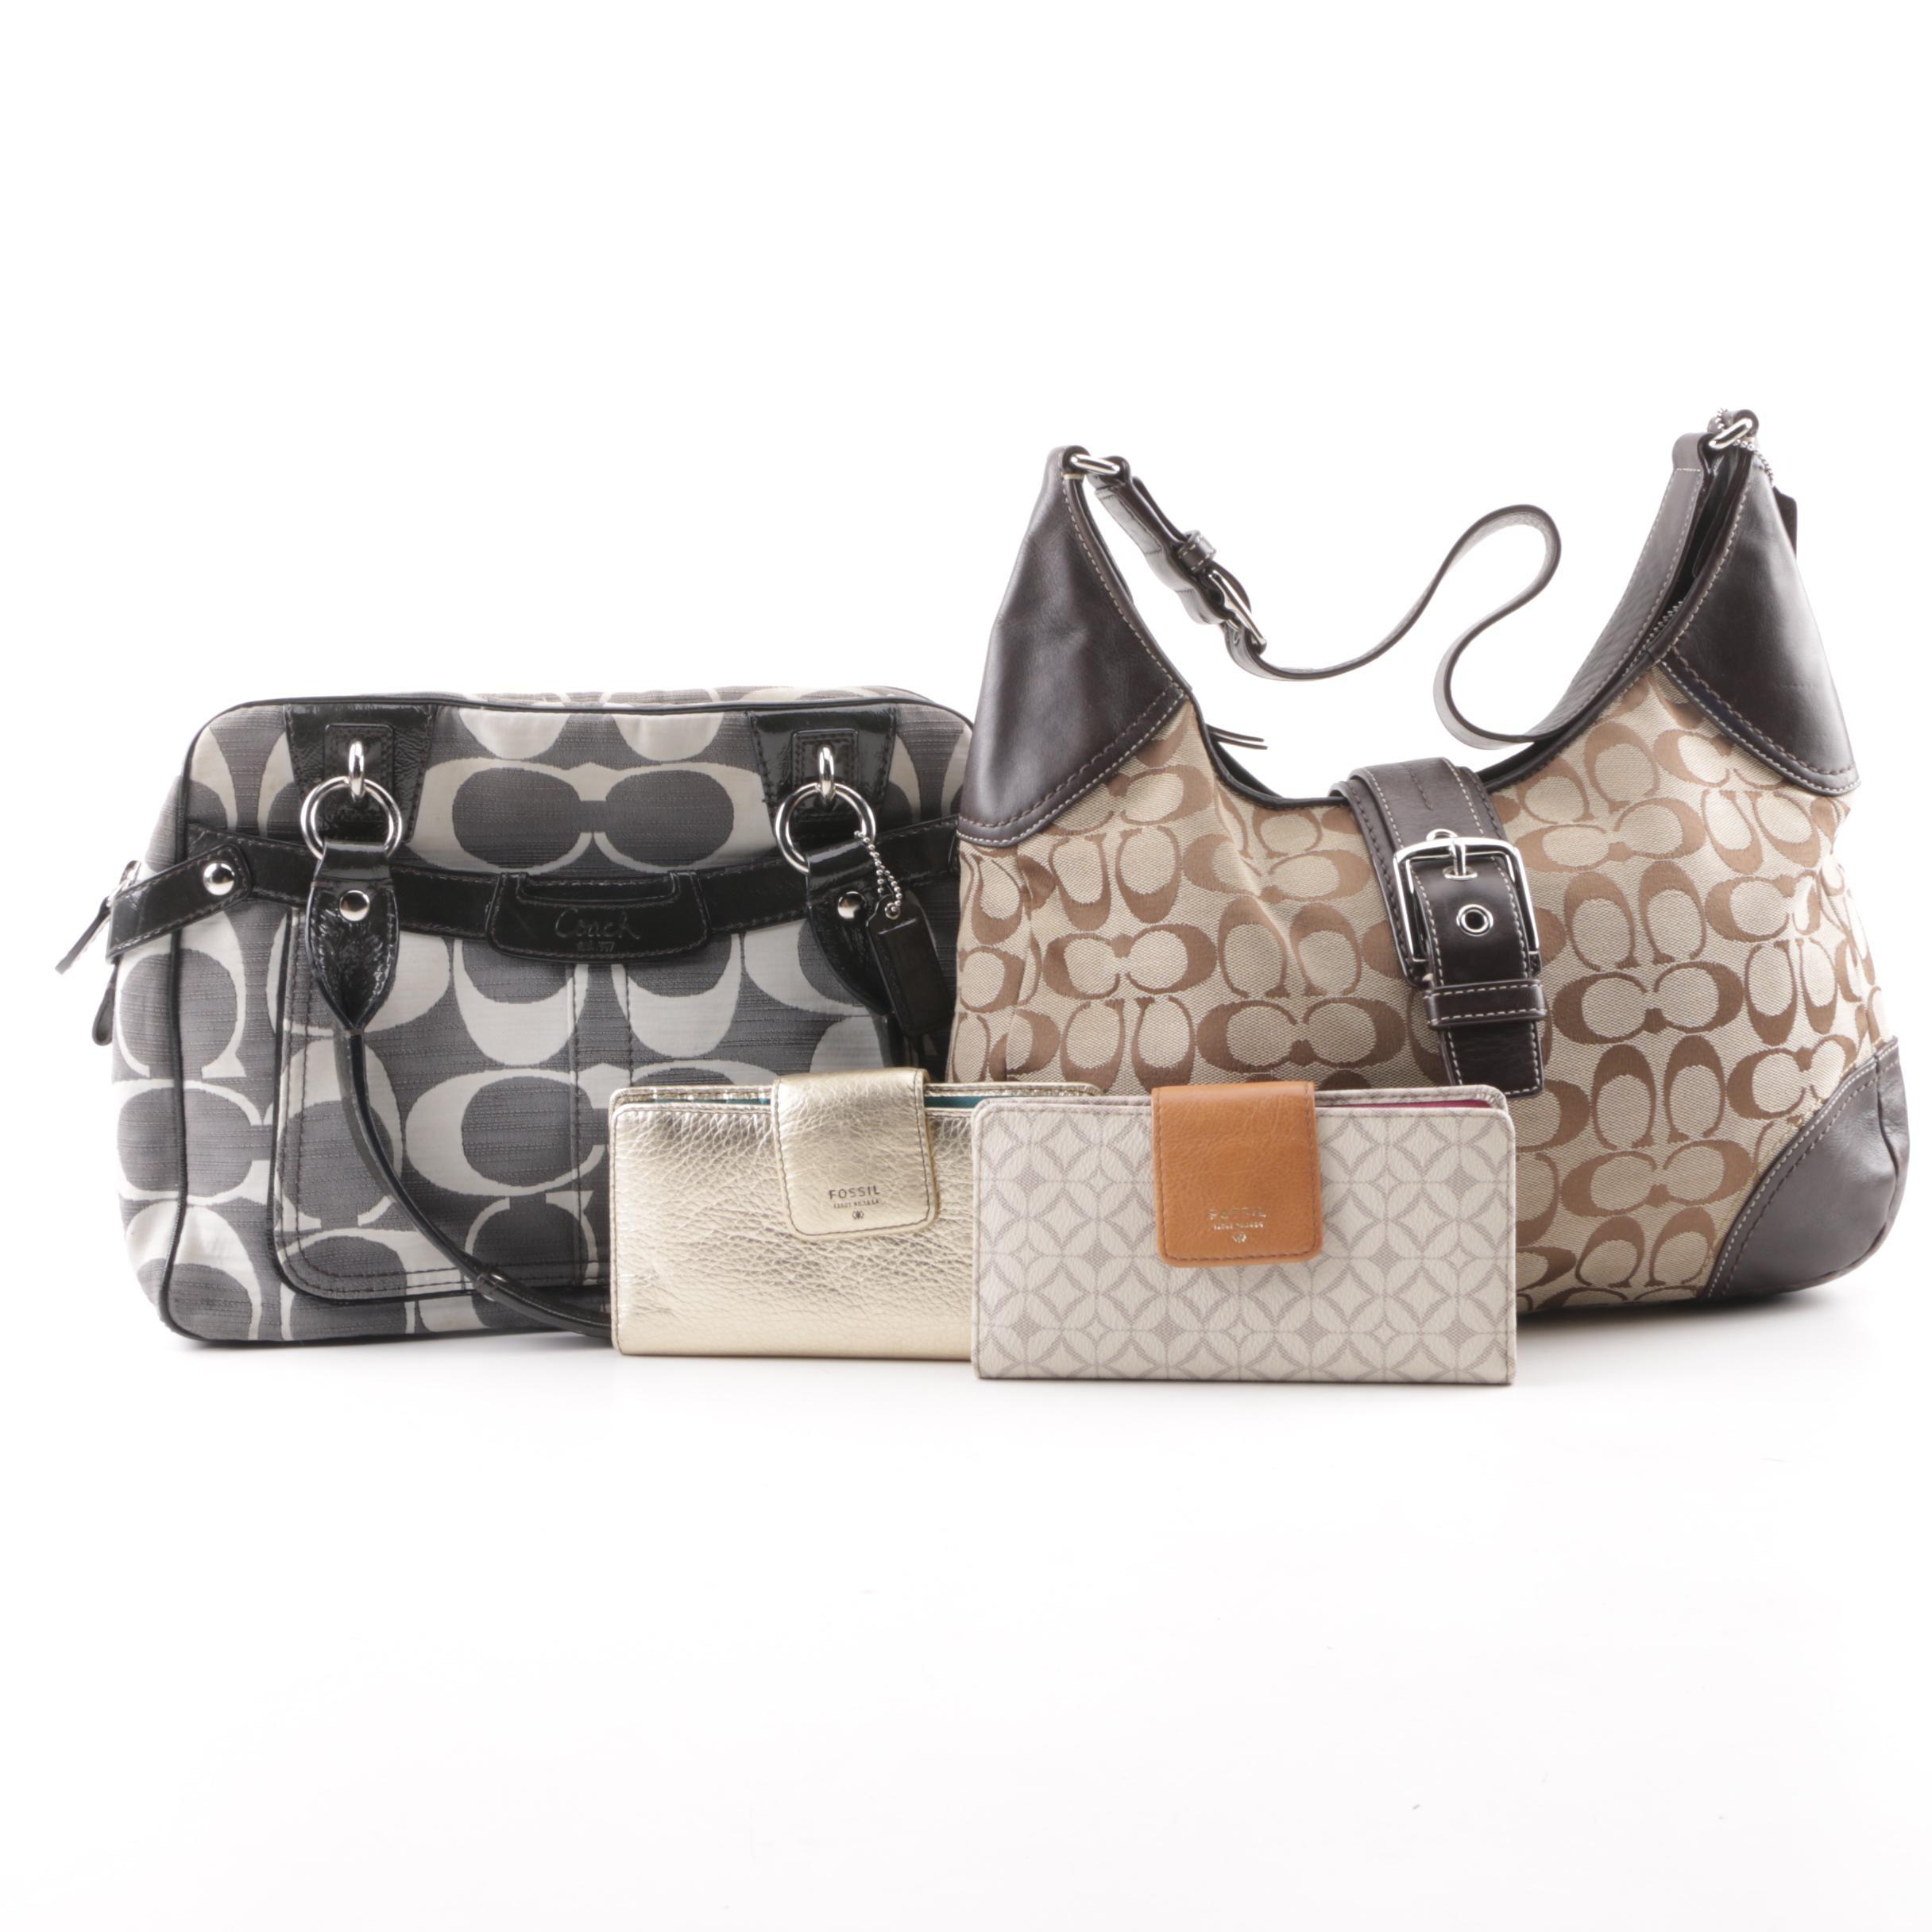 Coach Monogram Canvas Handbags and Fossil Wallets